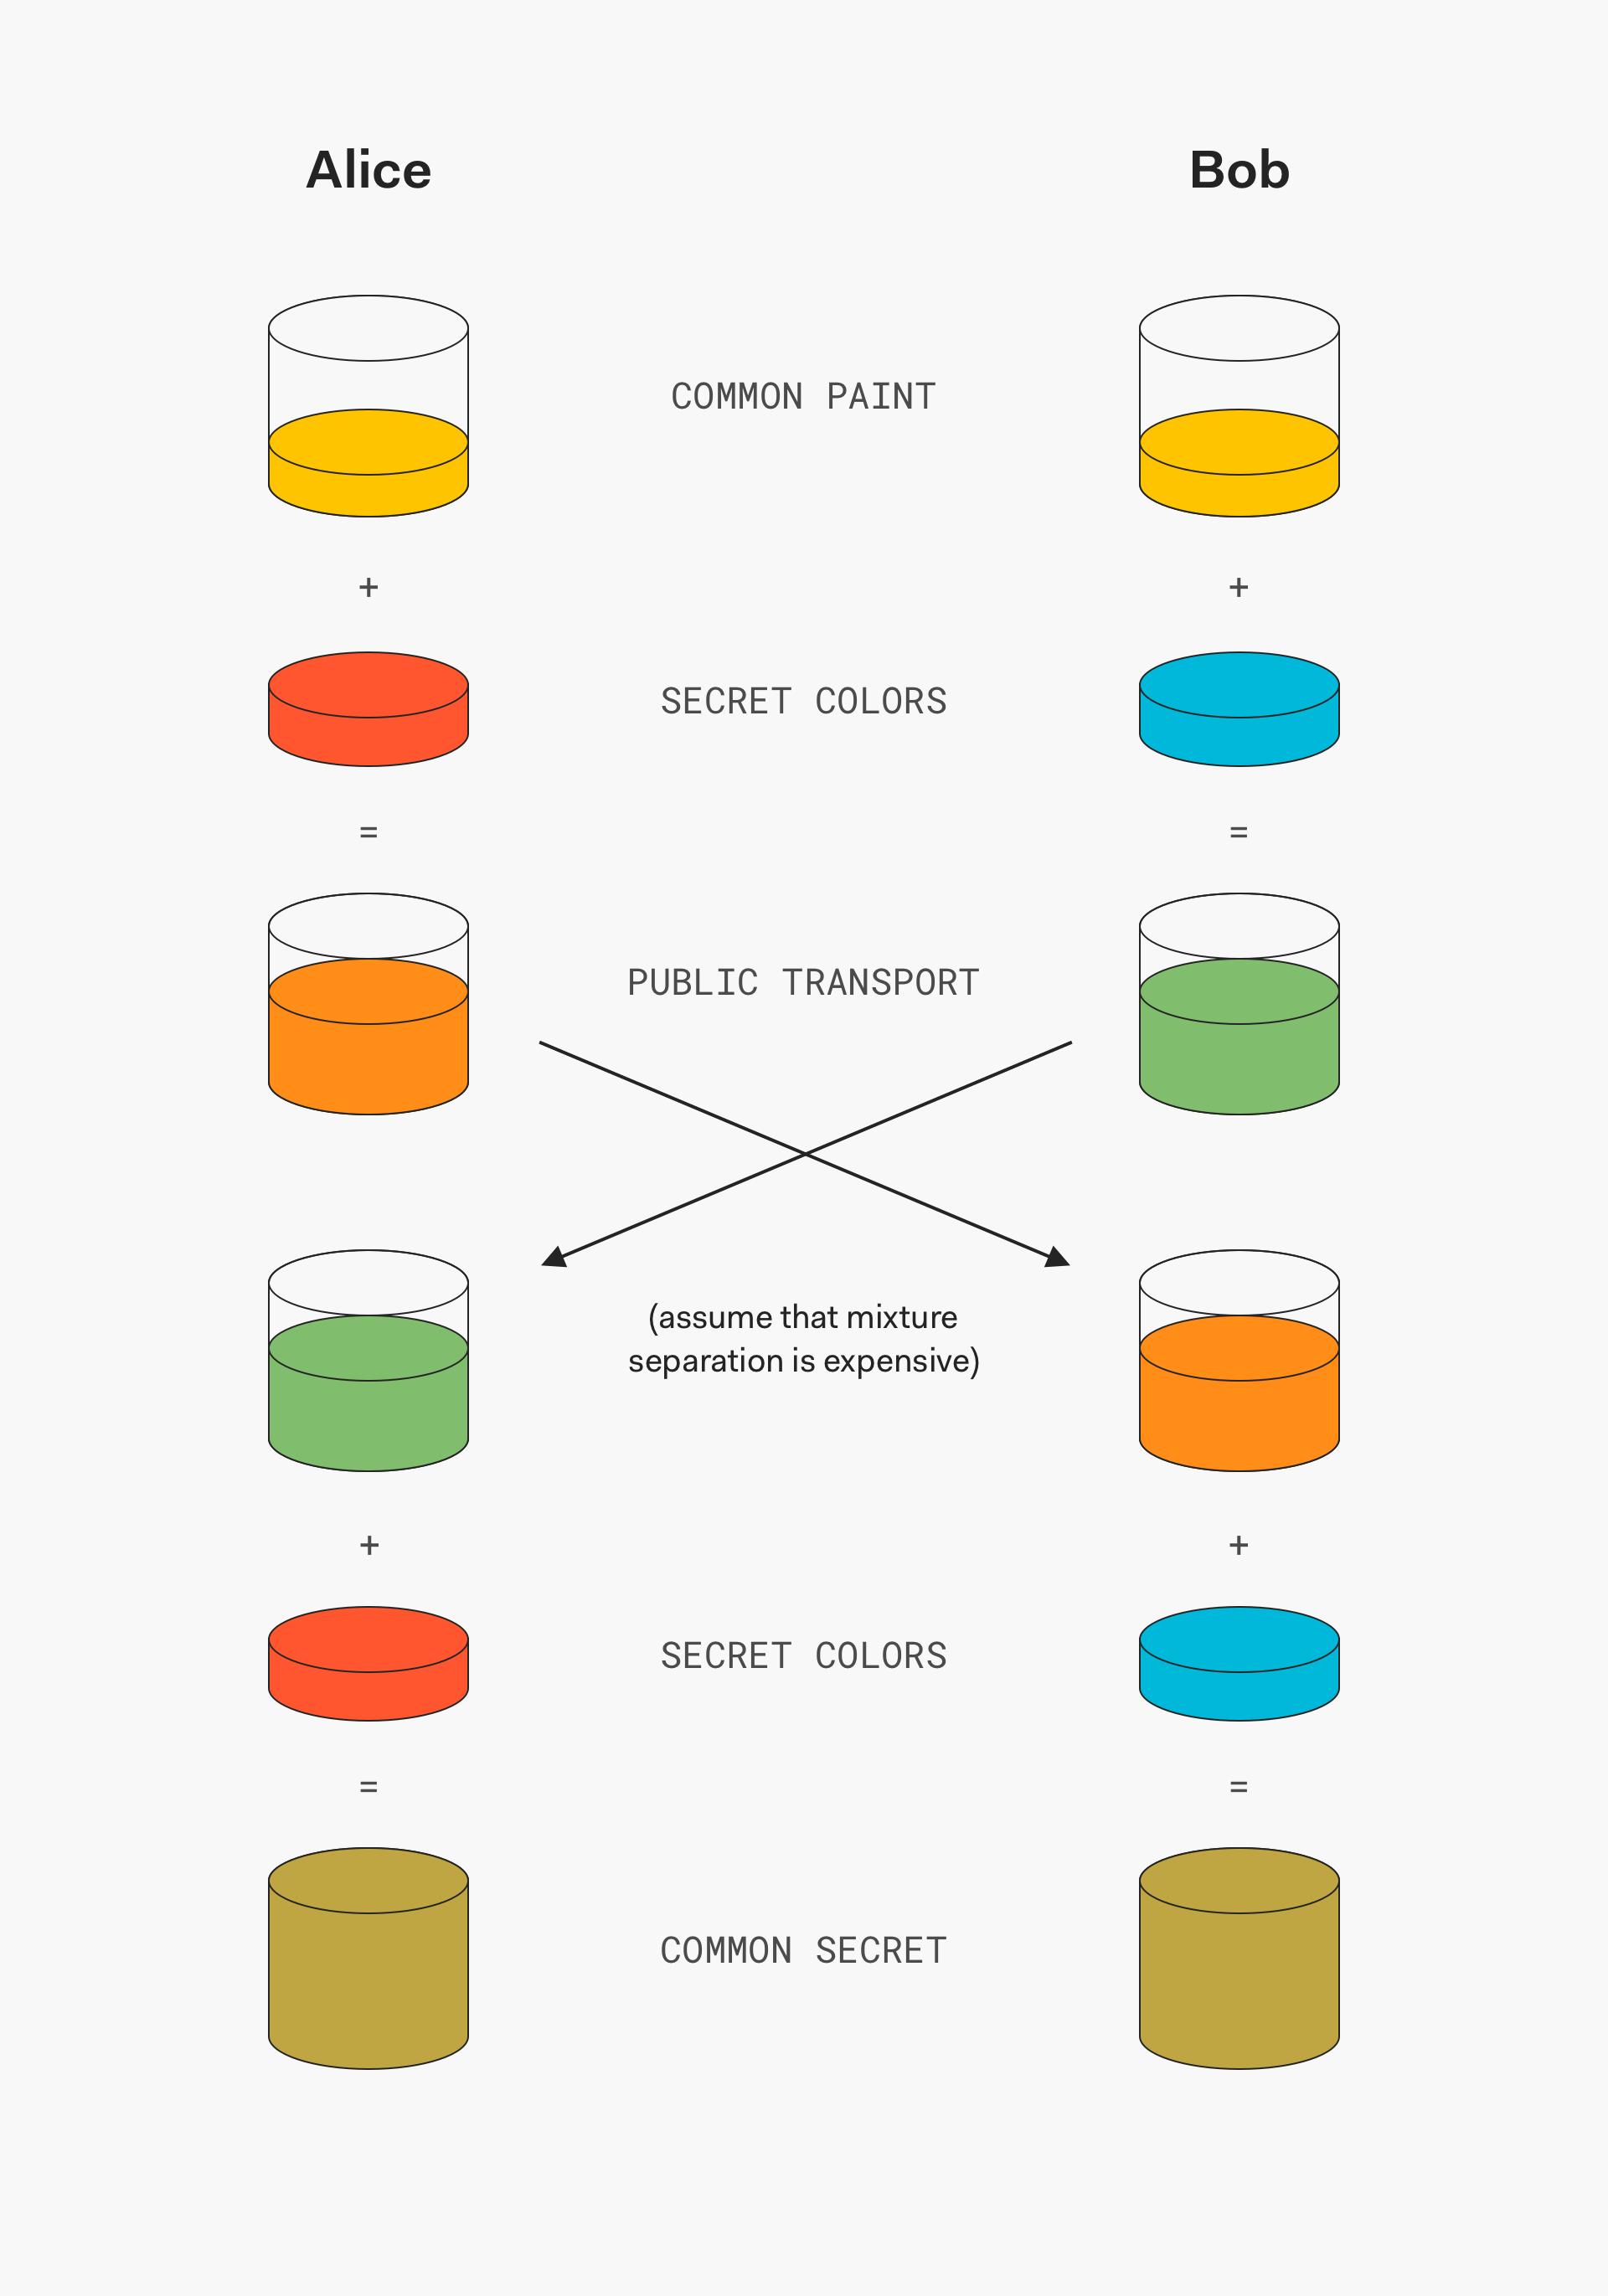 Diffie-Hellman_Key_Exchange diagram